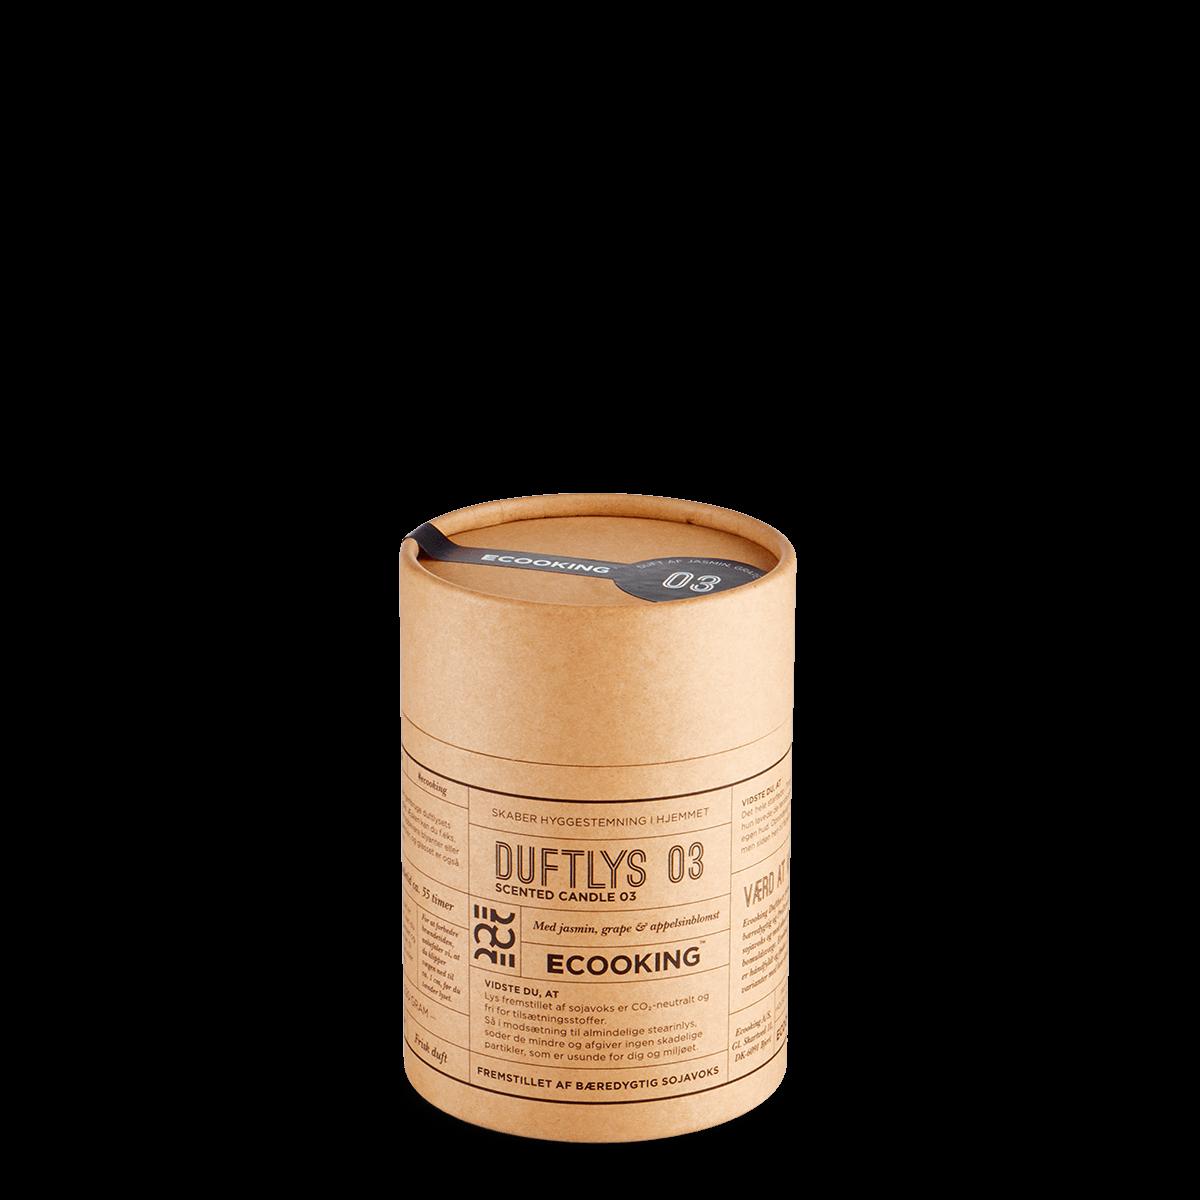 Duftlys 03 220 gram